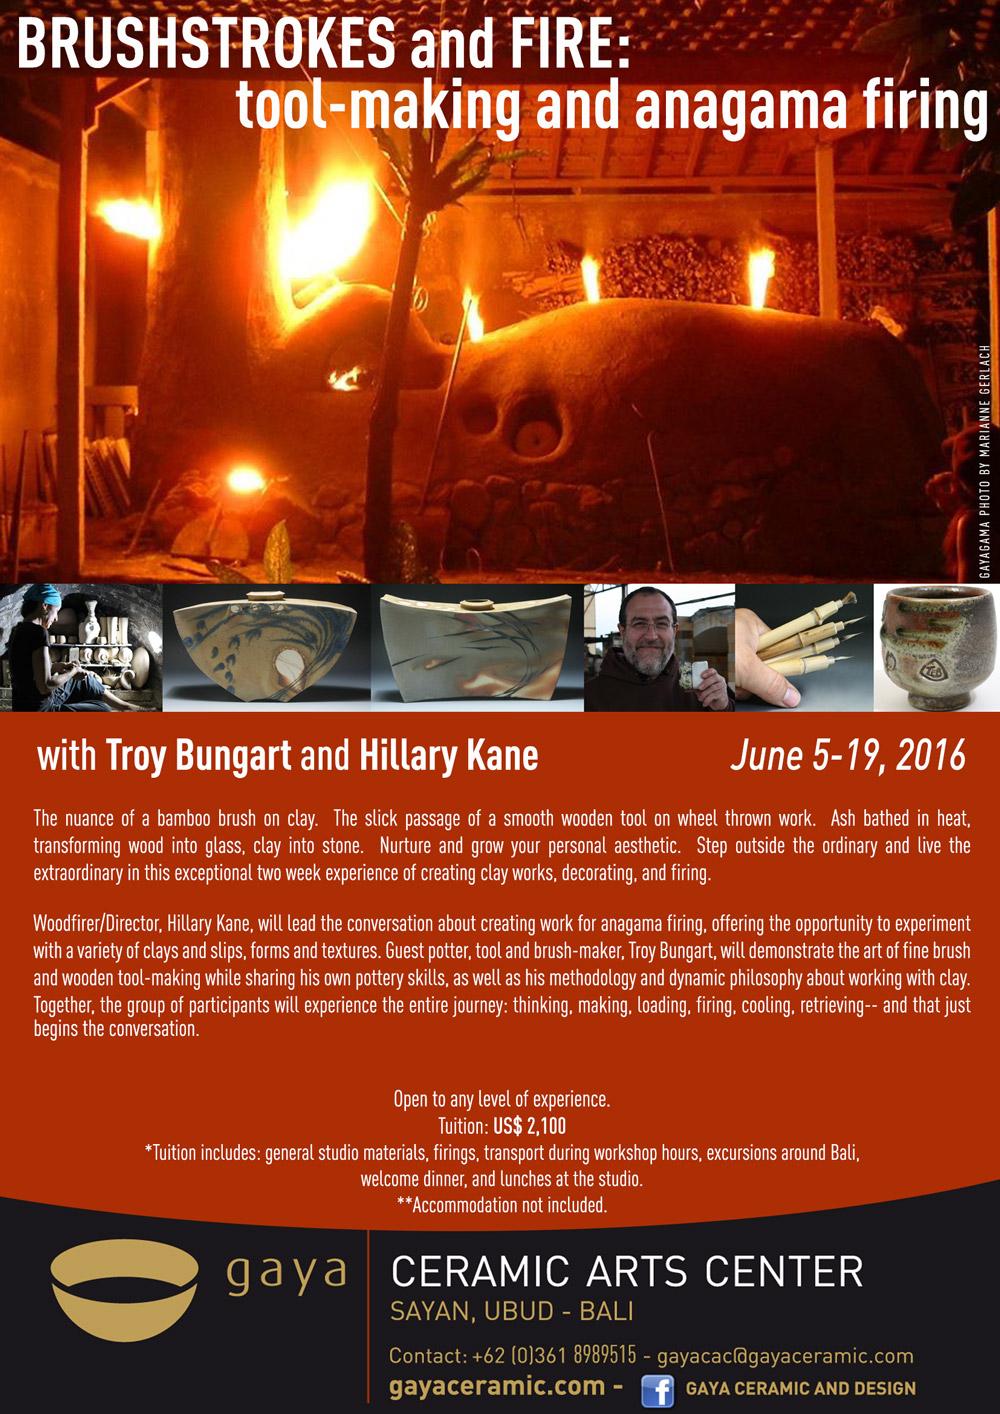 2016-06-HK-TroyBungart-Brushstrokes-and-Fire.jpg